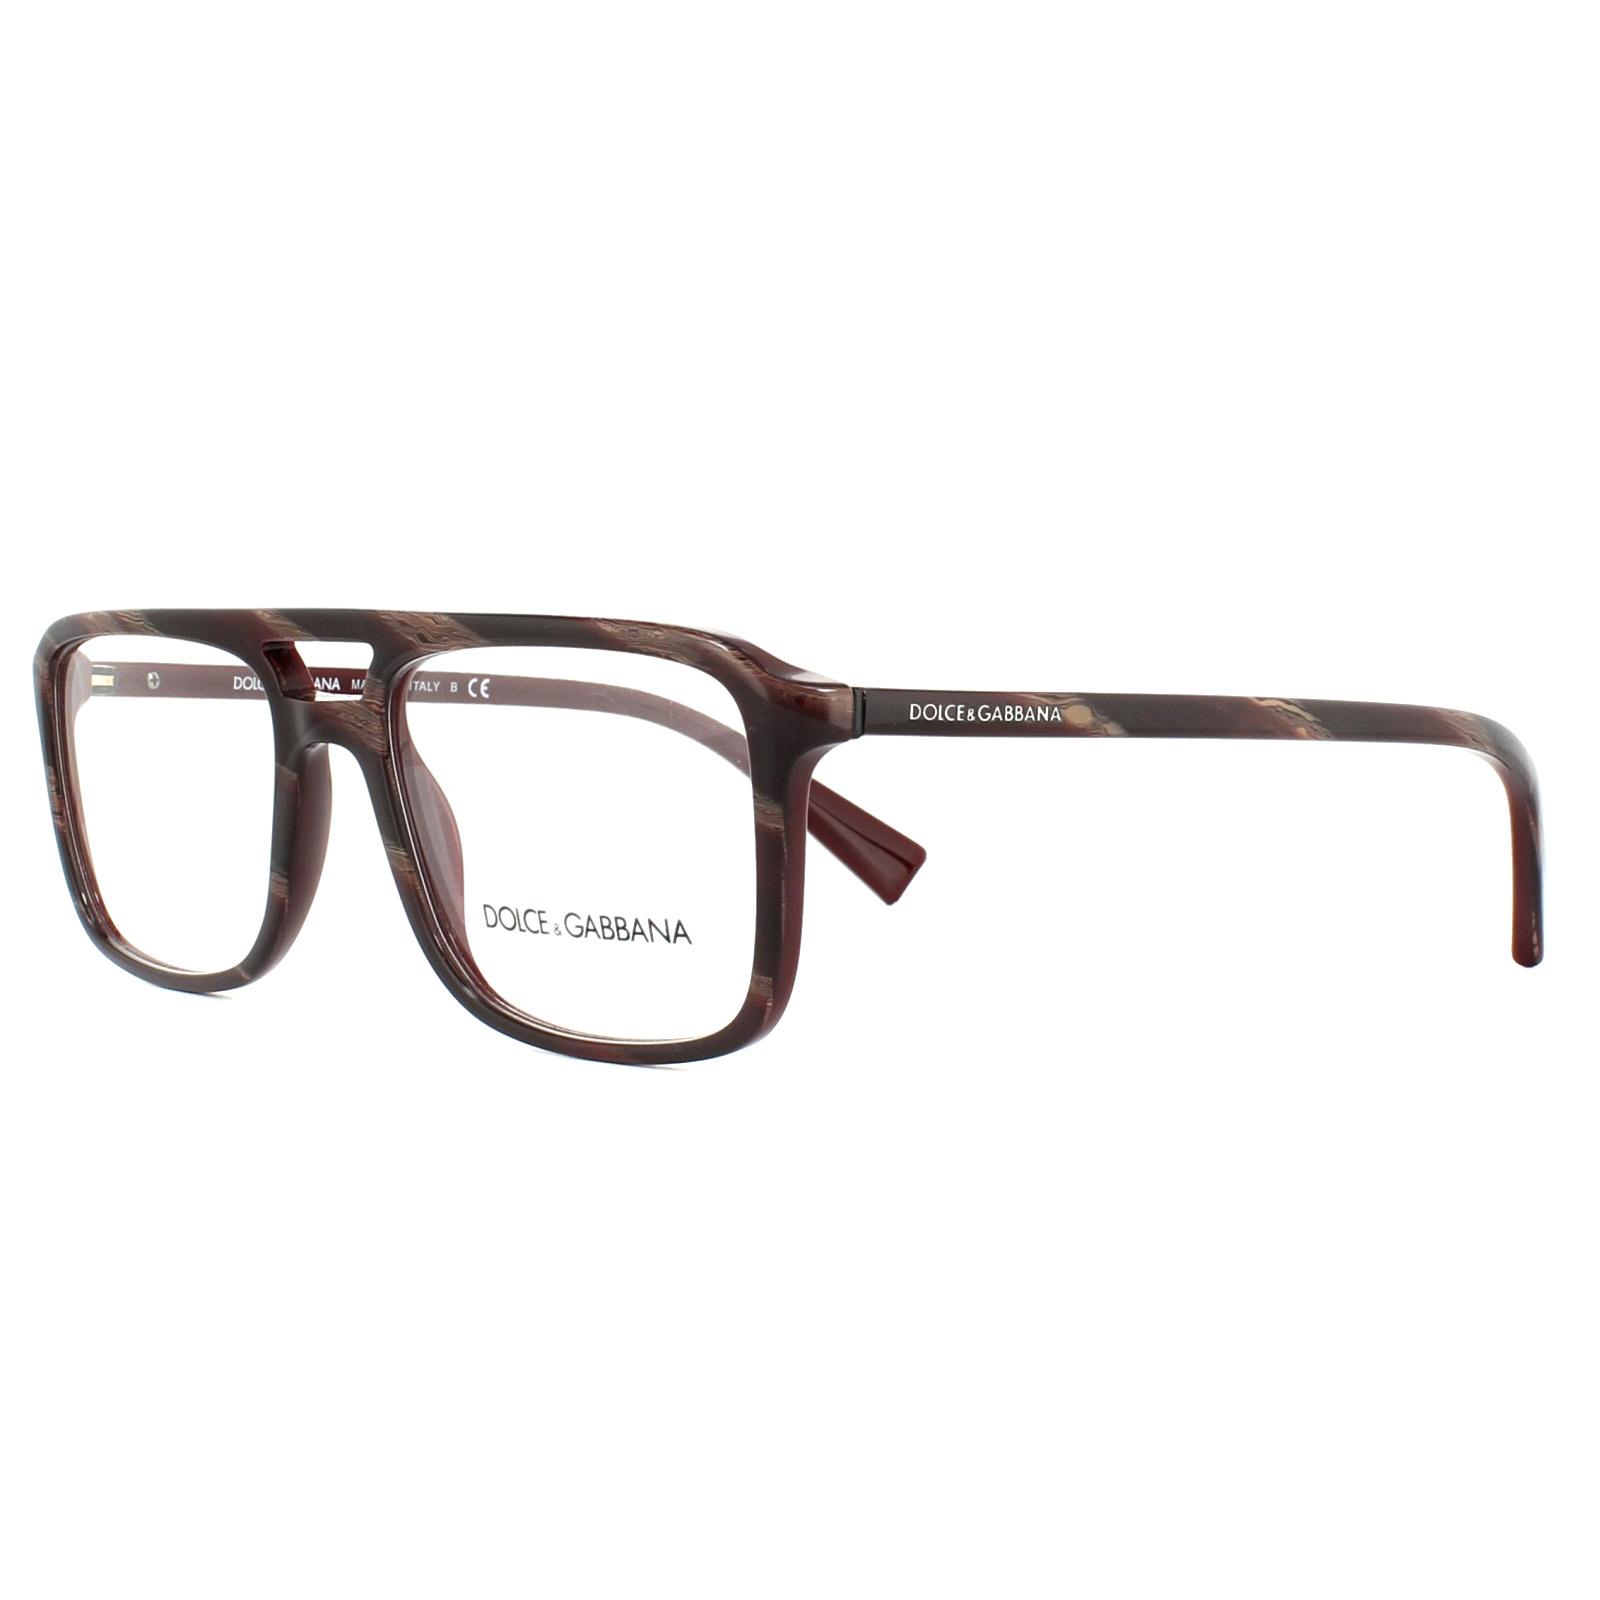 8679beddb988 Sentinel Dolce   Gabbana Glasses Frames DG 3267 3093 Striped Red on Bordeaux  54mm Mens